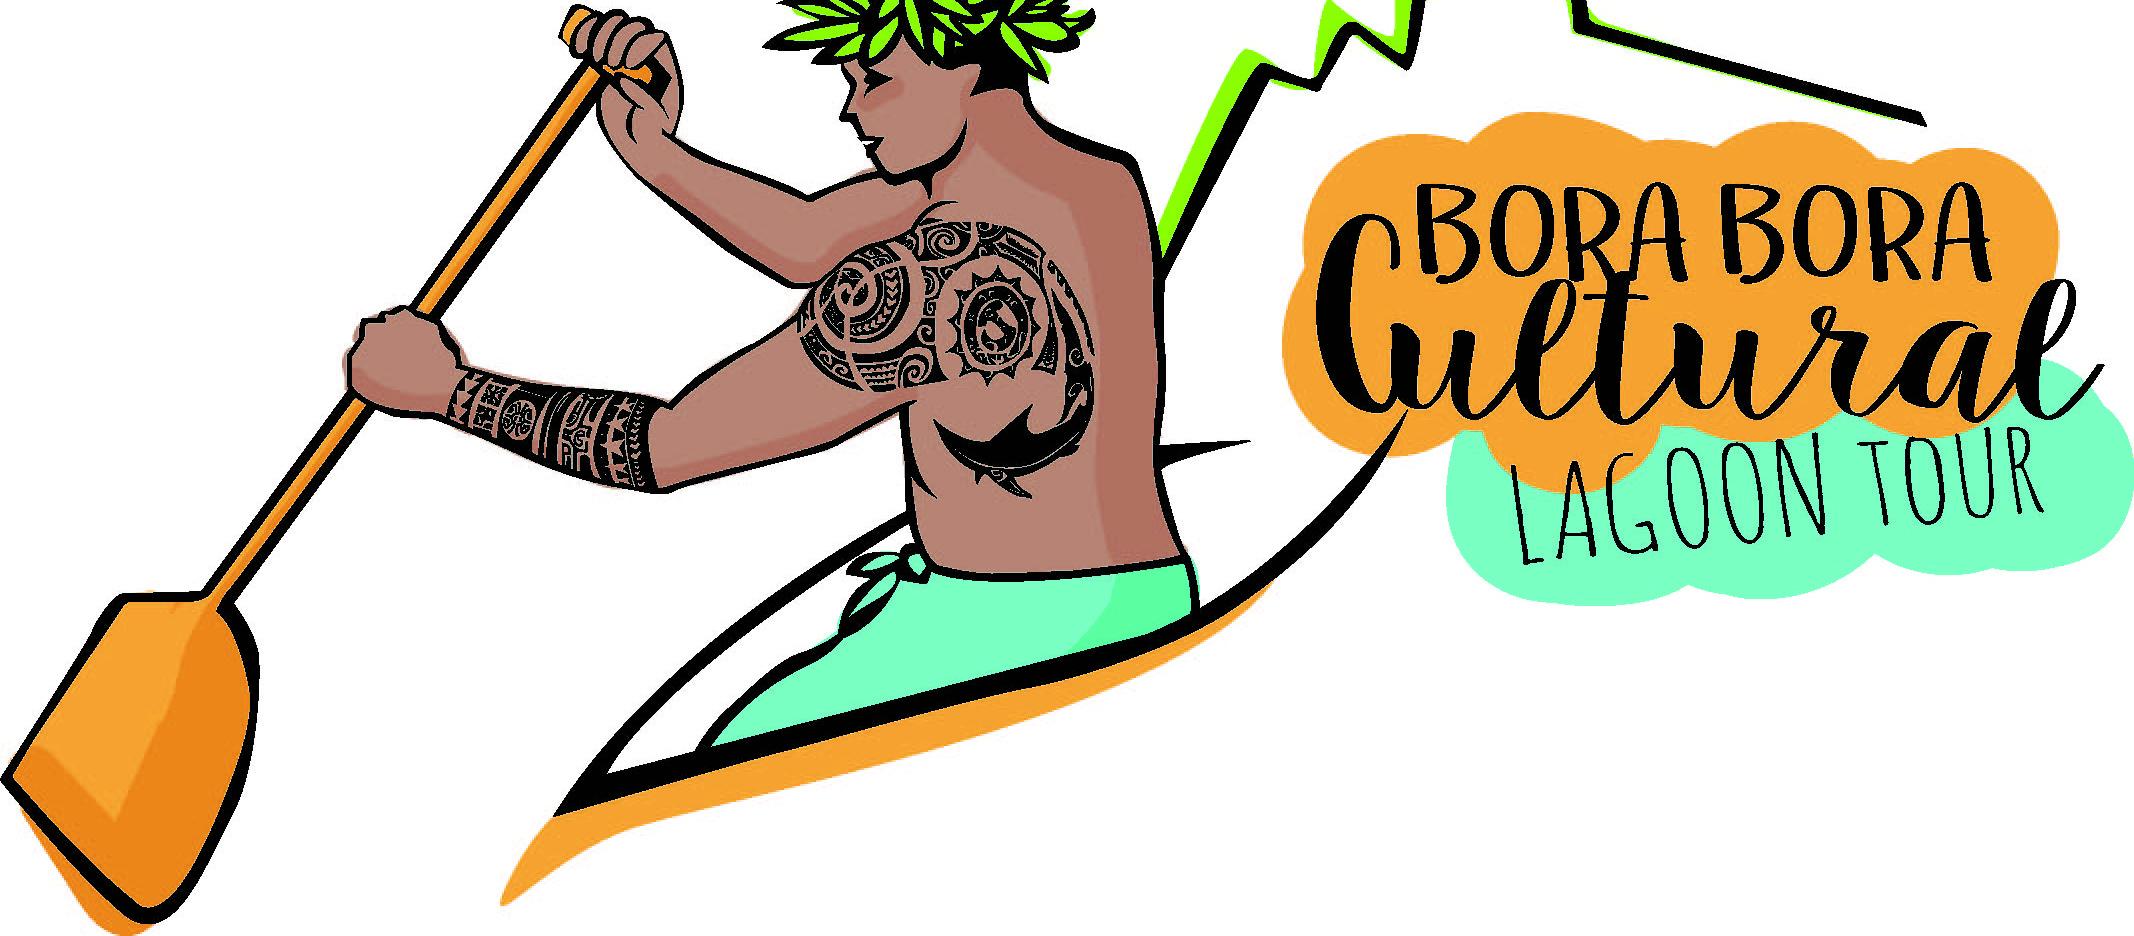 https://tahititourisme.nz/wp-content/uploads/2018/12/Bob-cultural-lagoon-tour.jpg